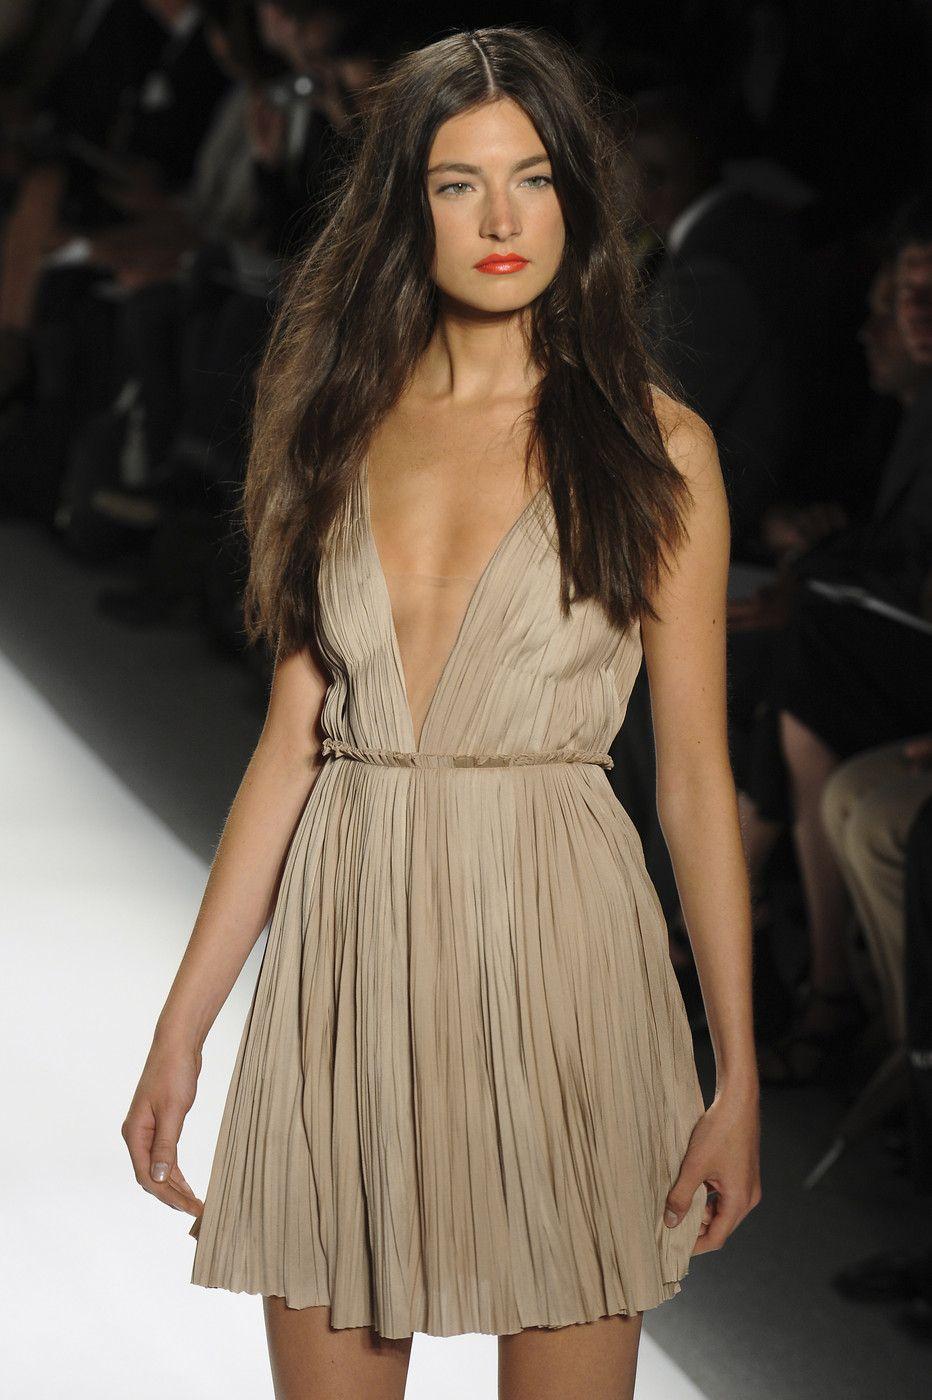 J Jablonski Mendel Spring 2011. hair + dress... wish i had no boobs so i could wear a dress just like this.